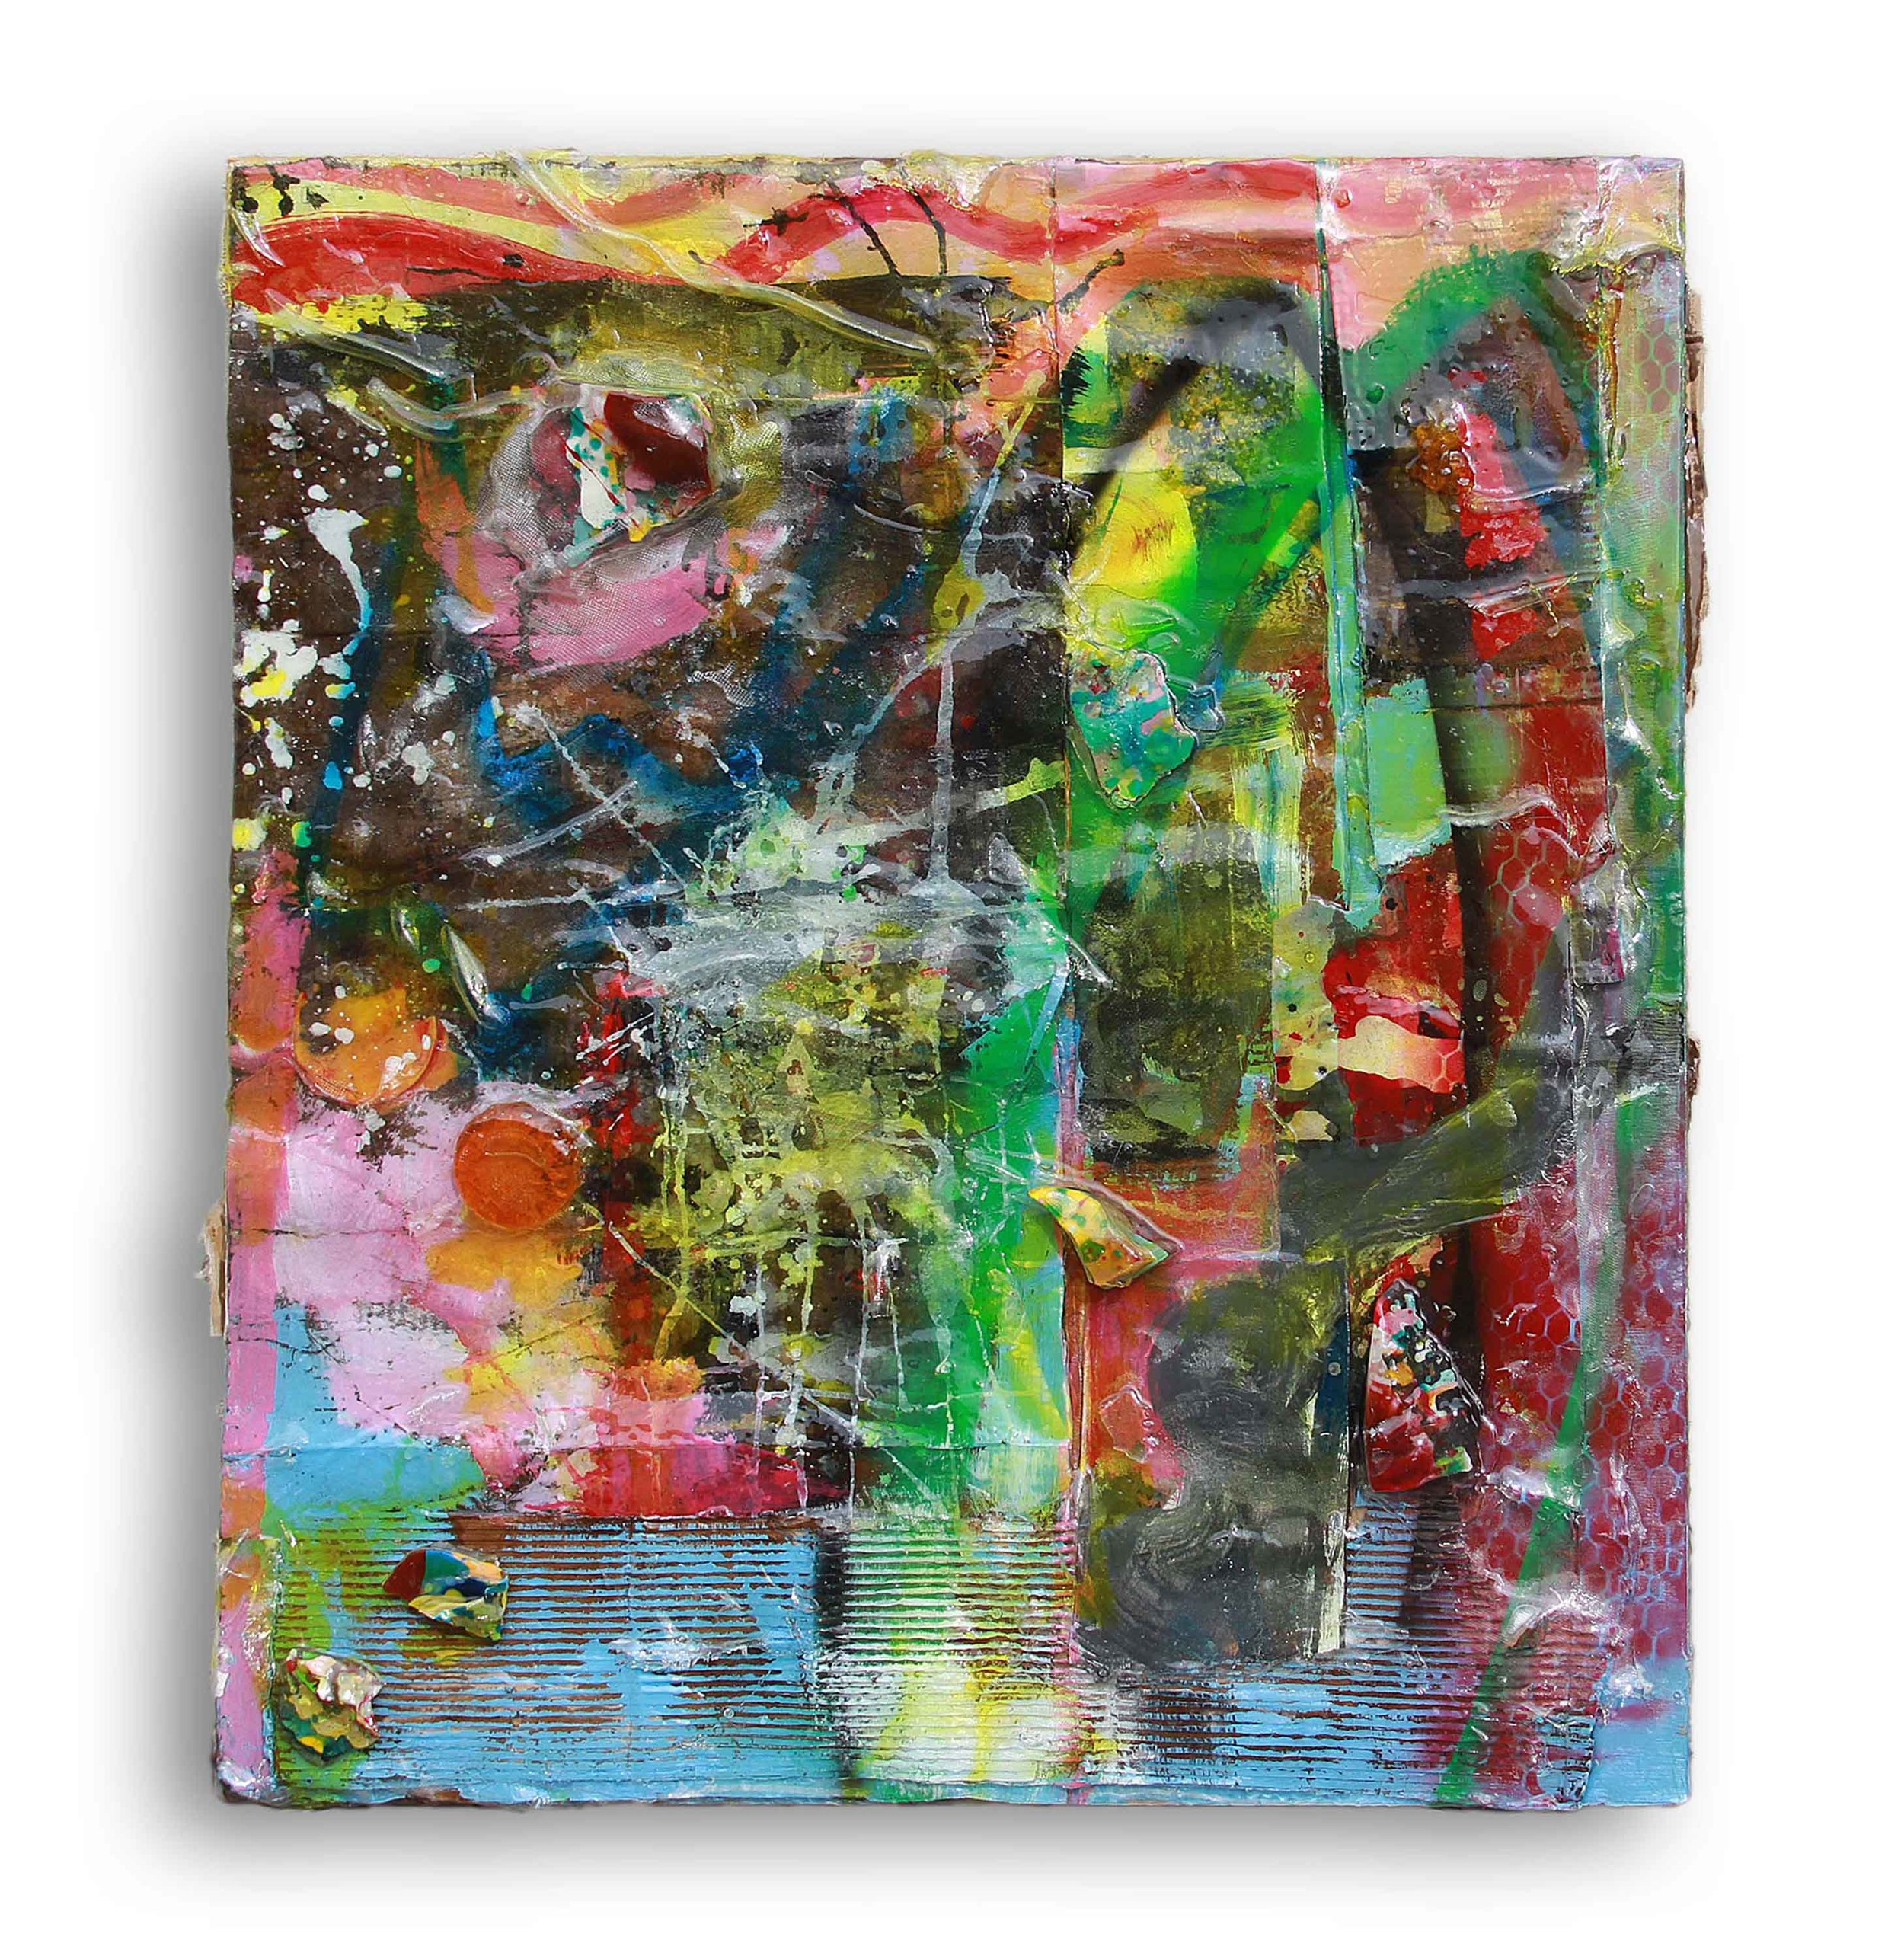 23 Resin Painting CC IMG_9058 03 LR.jpg